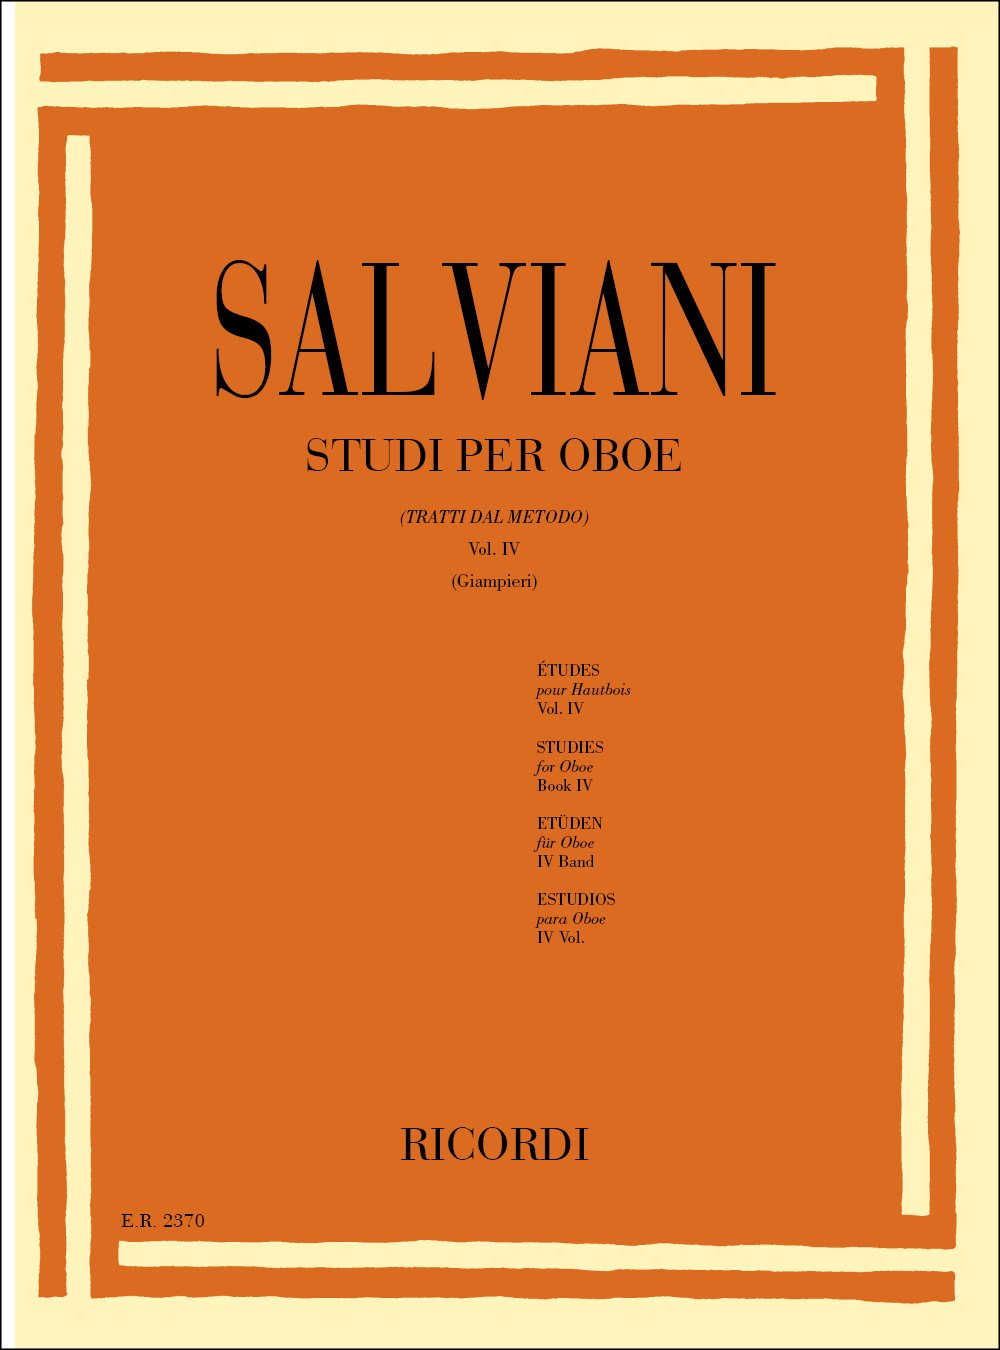 C. Salviani: Studi per oboe (tratti dal Metodo) Vol. IV: Oboe